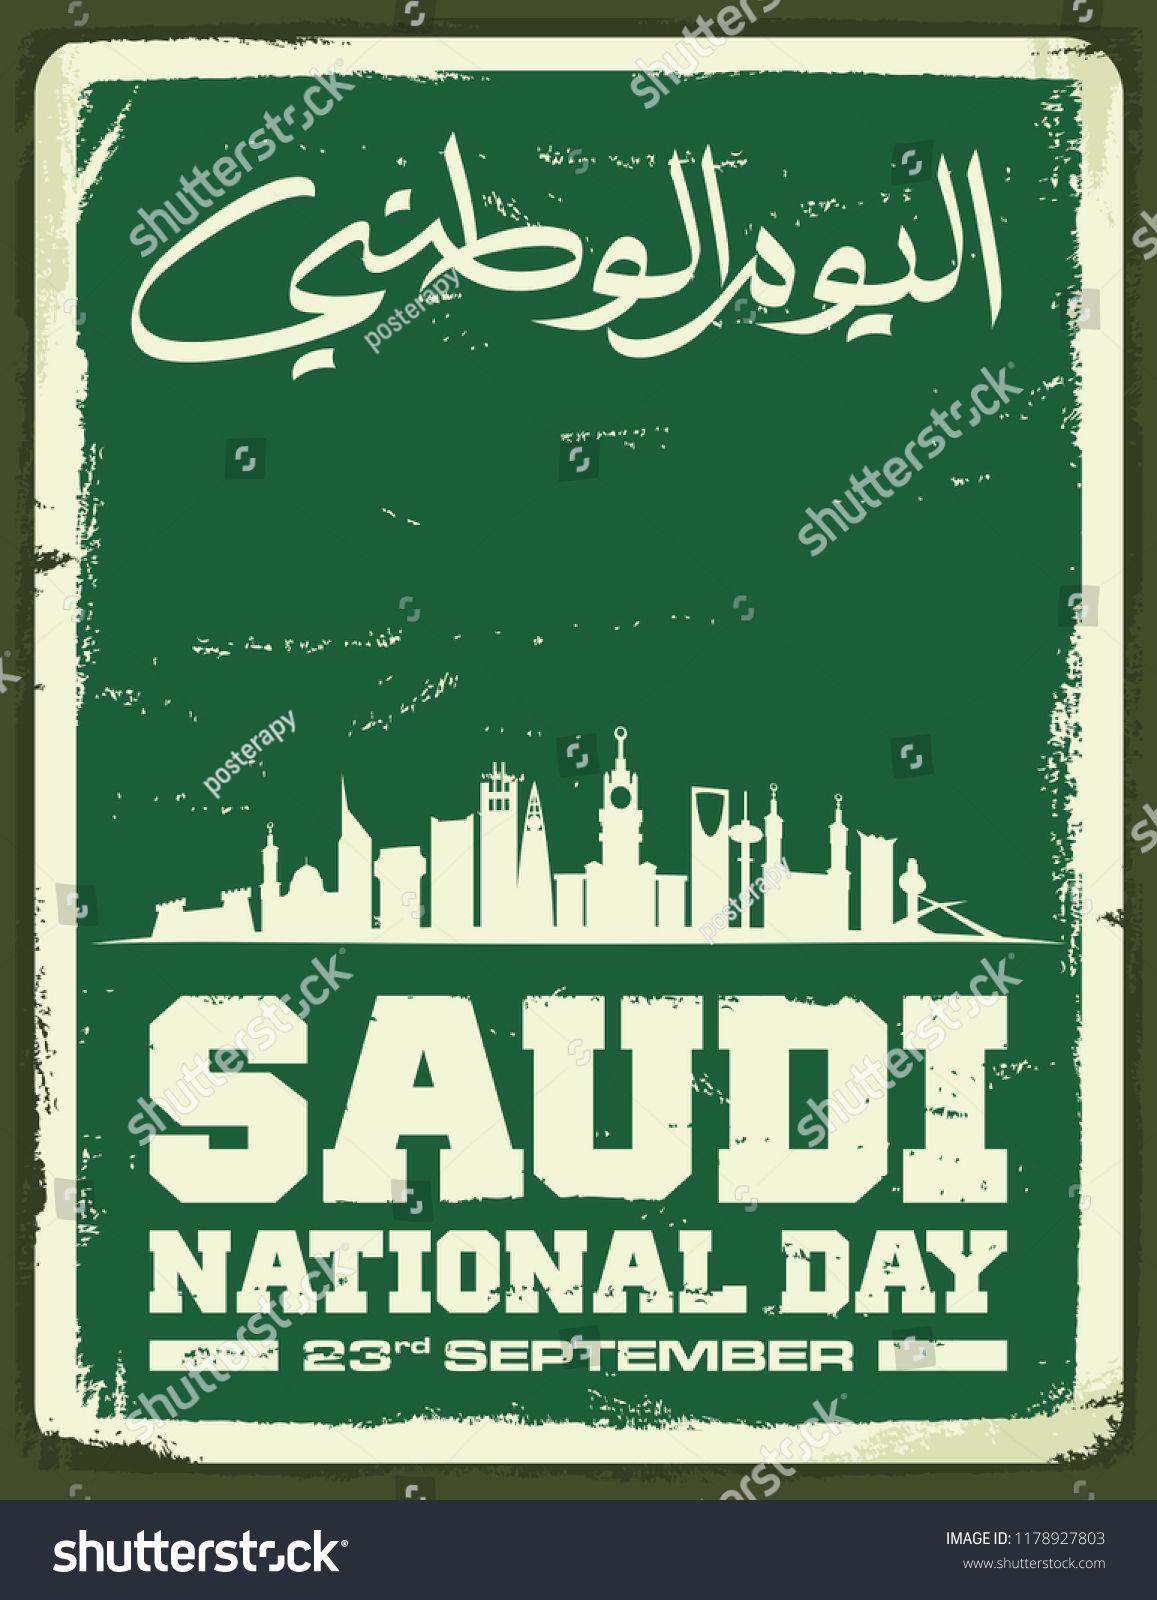 Vintage Poster Skyline Of Saudi Arabia Arabic Translation National Day Retro Illustration Vector Eps 10 National Day Saudi Retro Illustration Heart Icons